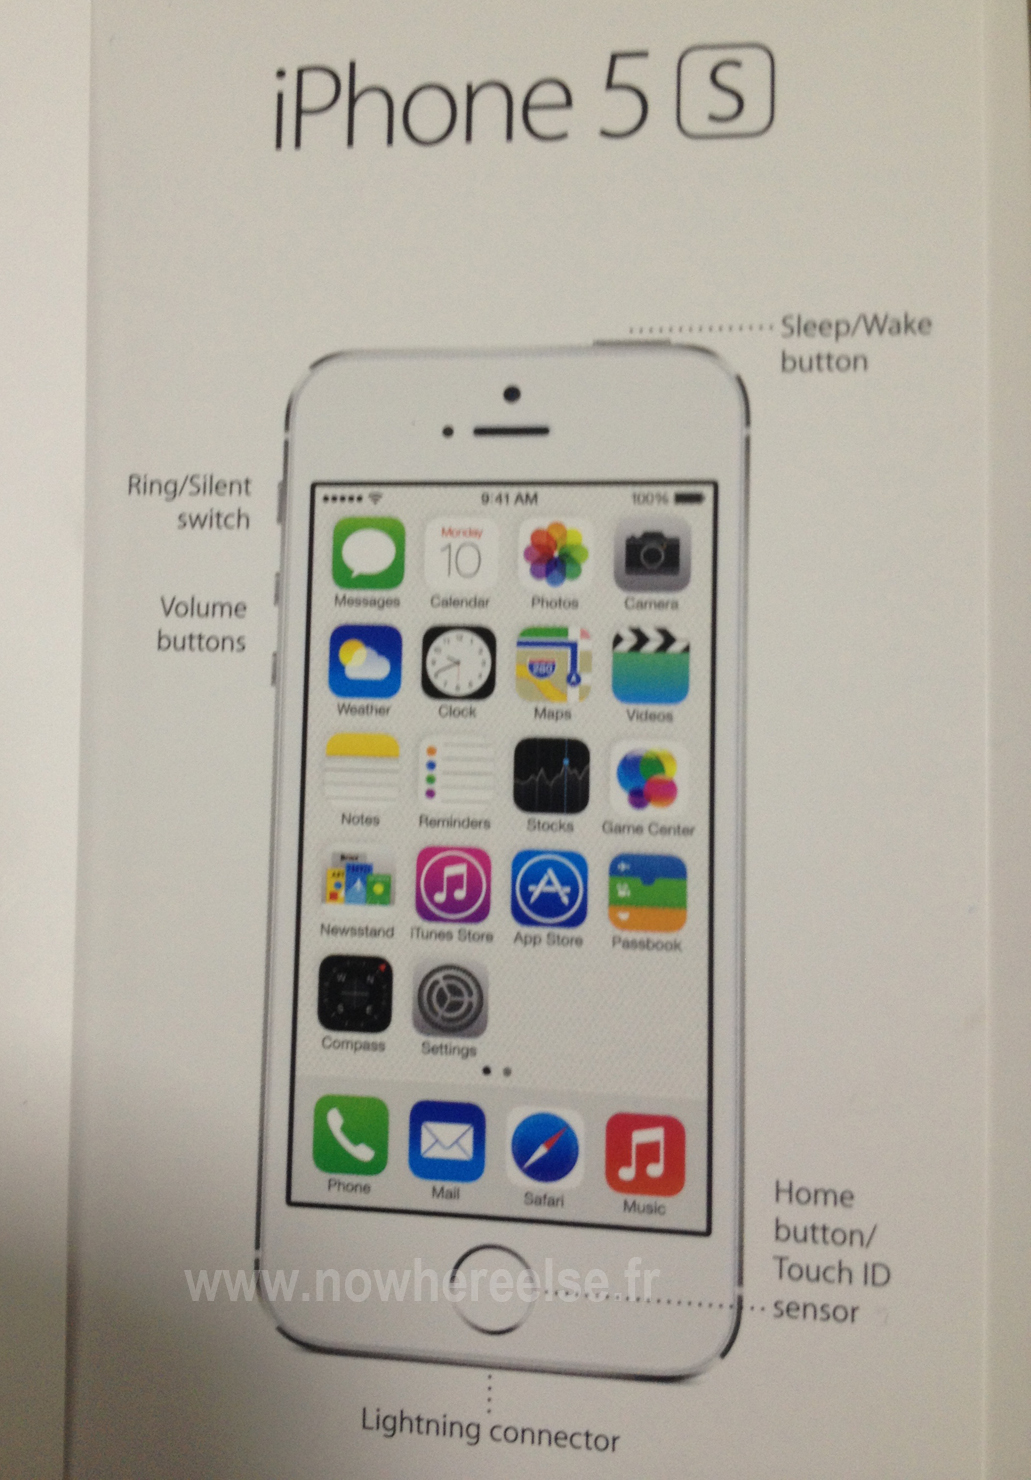 Manual de Usuario iPhone 5S